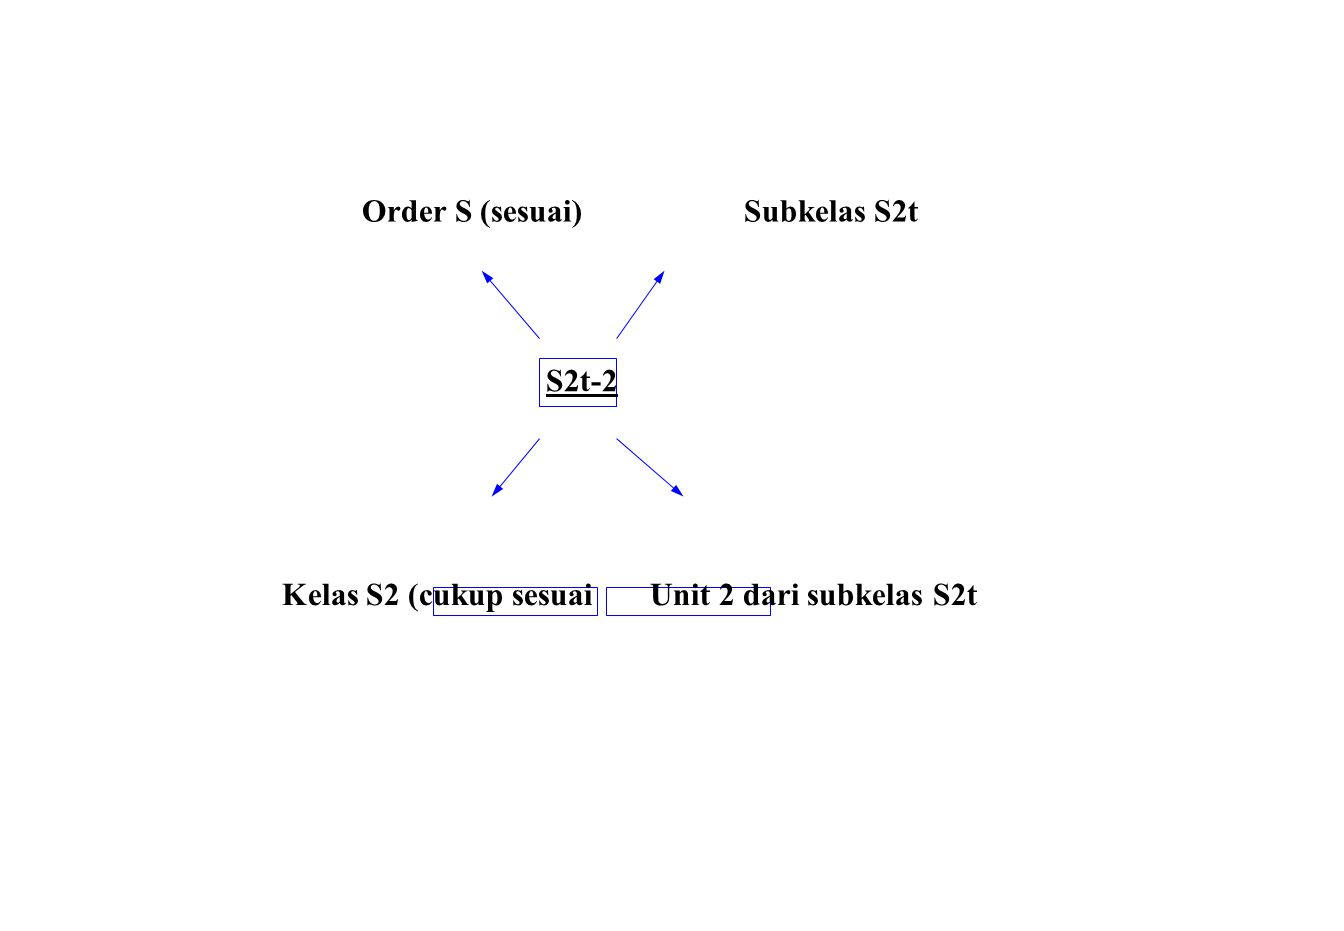 Order S (sesuai) Subkelas S2t